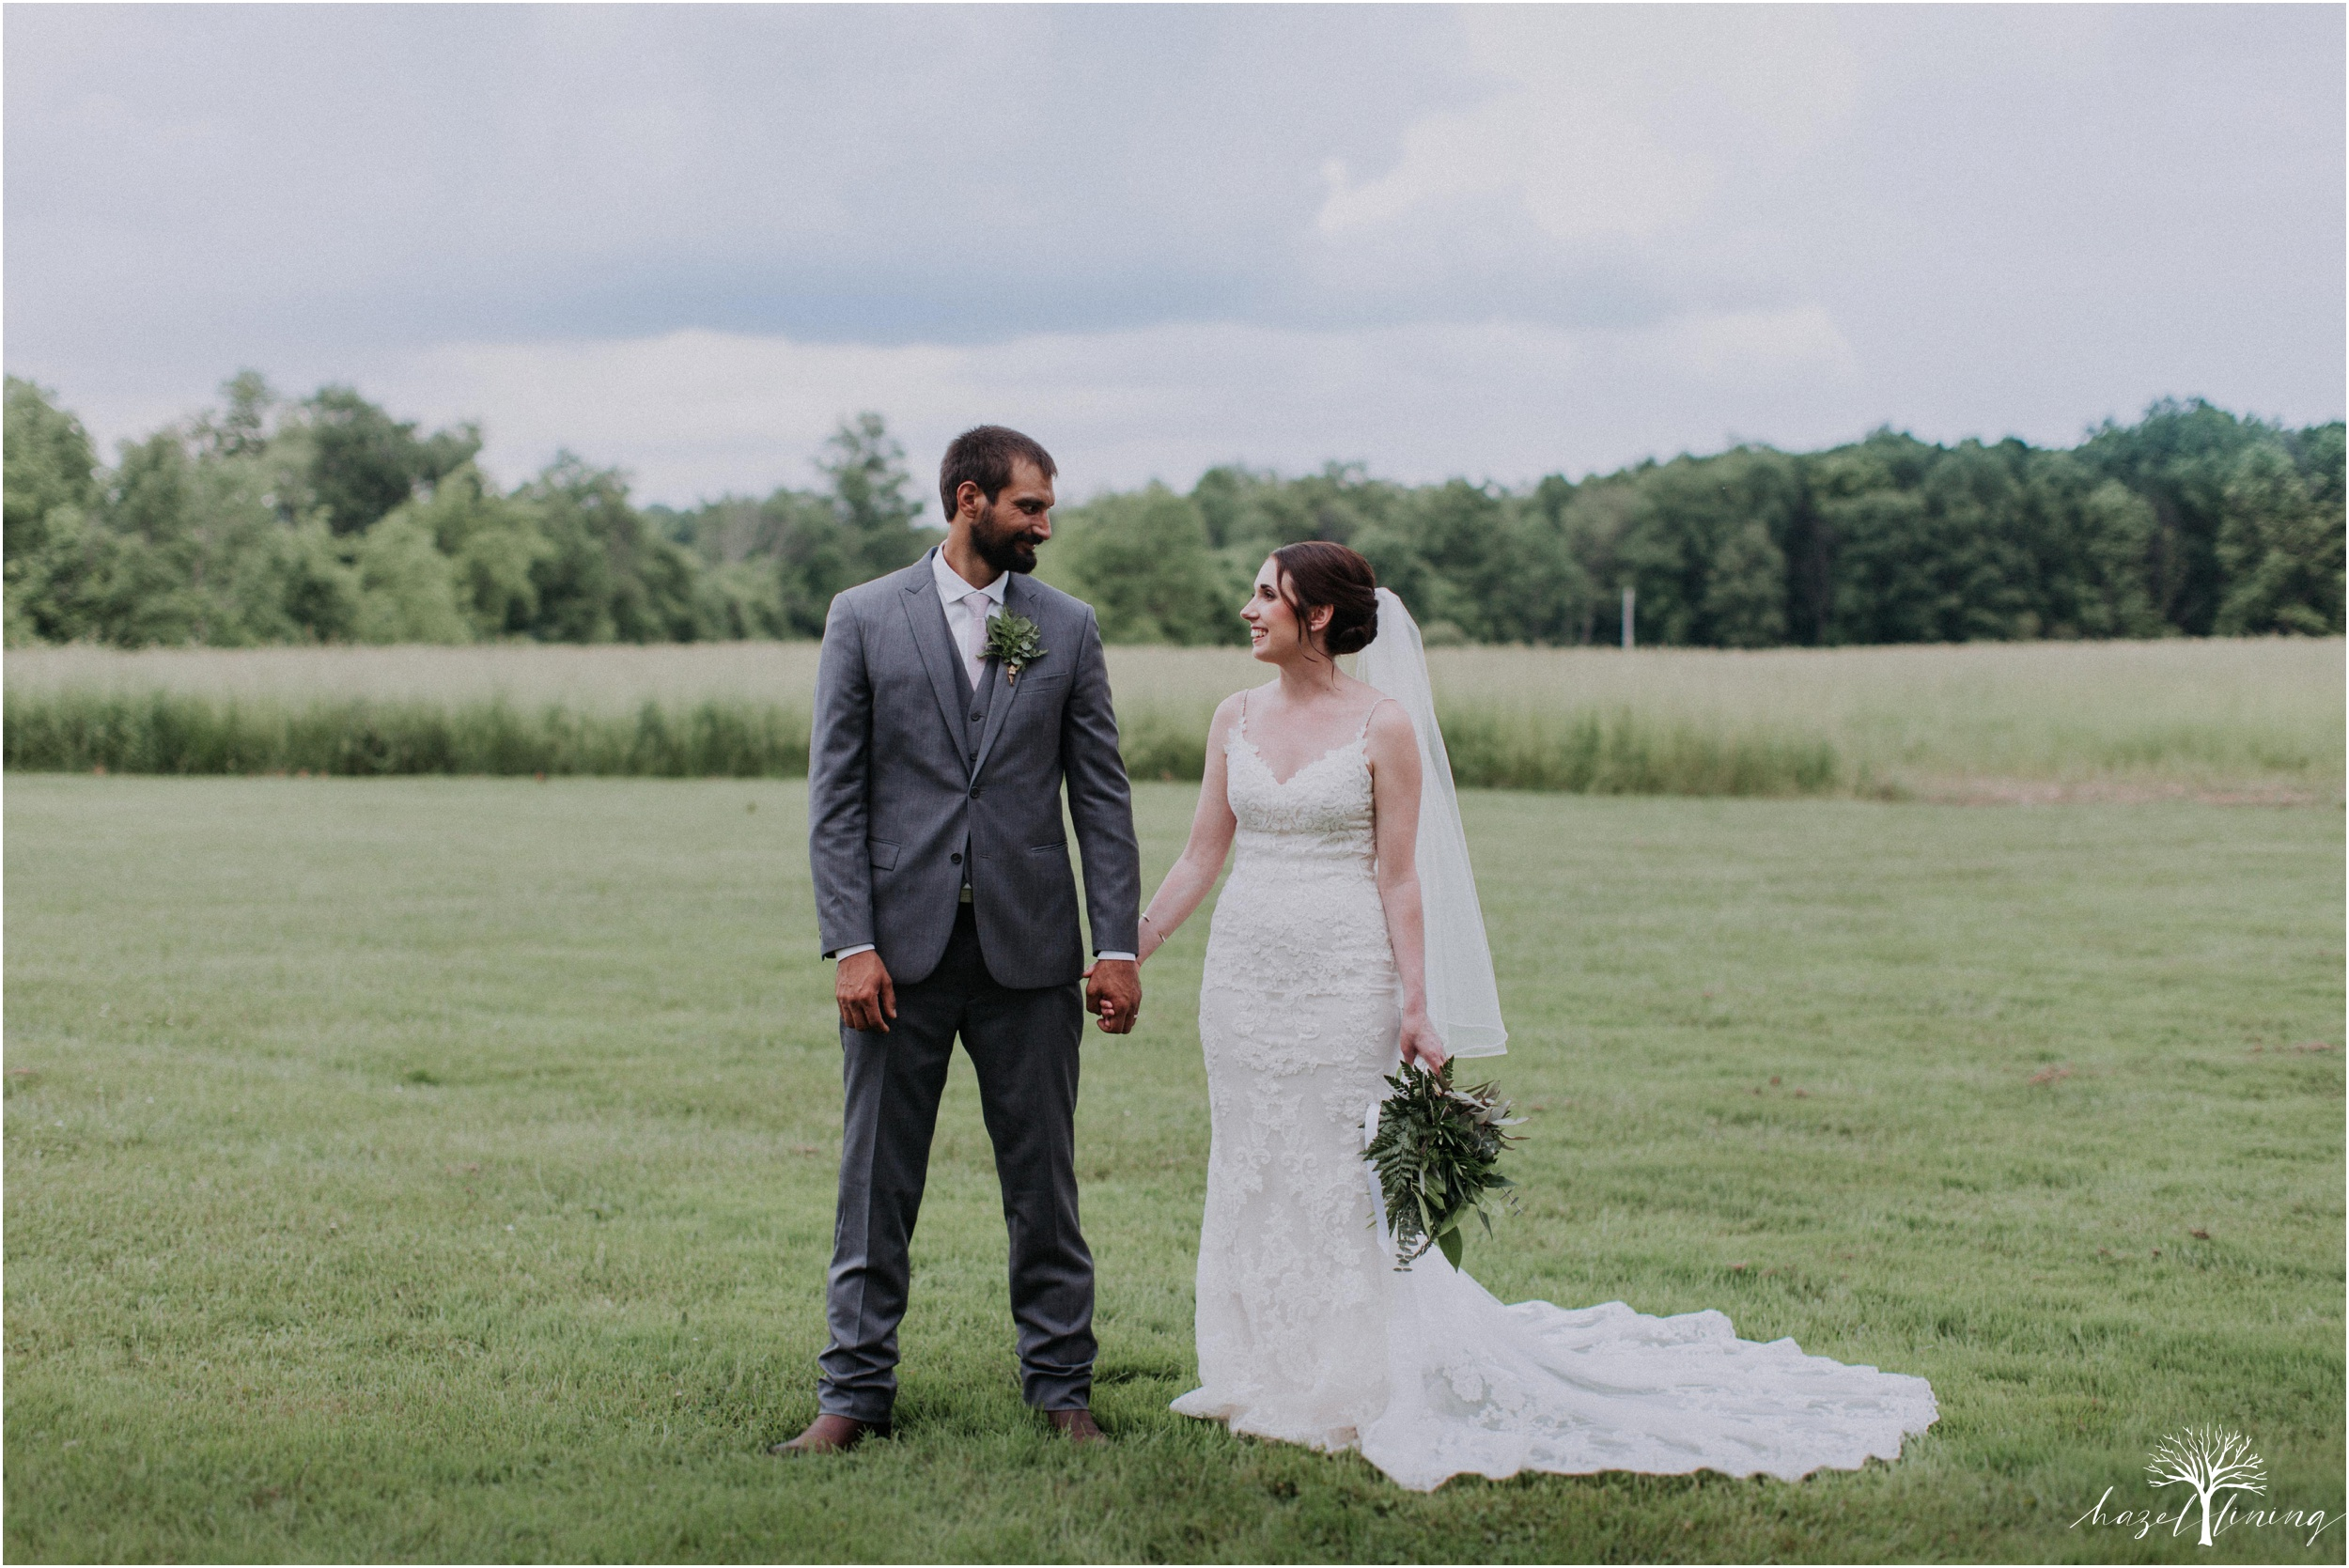 hazel-lining-travel-wedding-elopement-photography-lisa-landon-shoemaker-the-farm-bakery-and-events-bucks-county-quakertown-pennsylvania-summer-country-outdoor-farm-wedding_0087.jpg